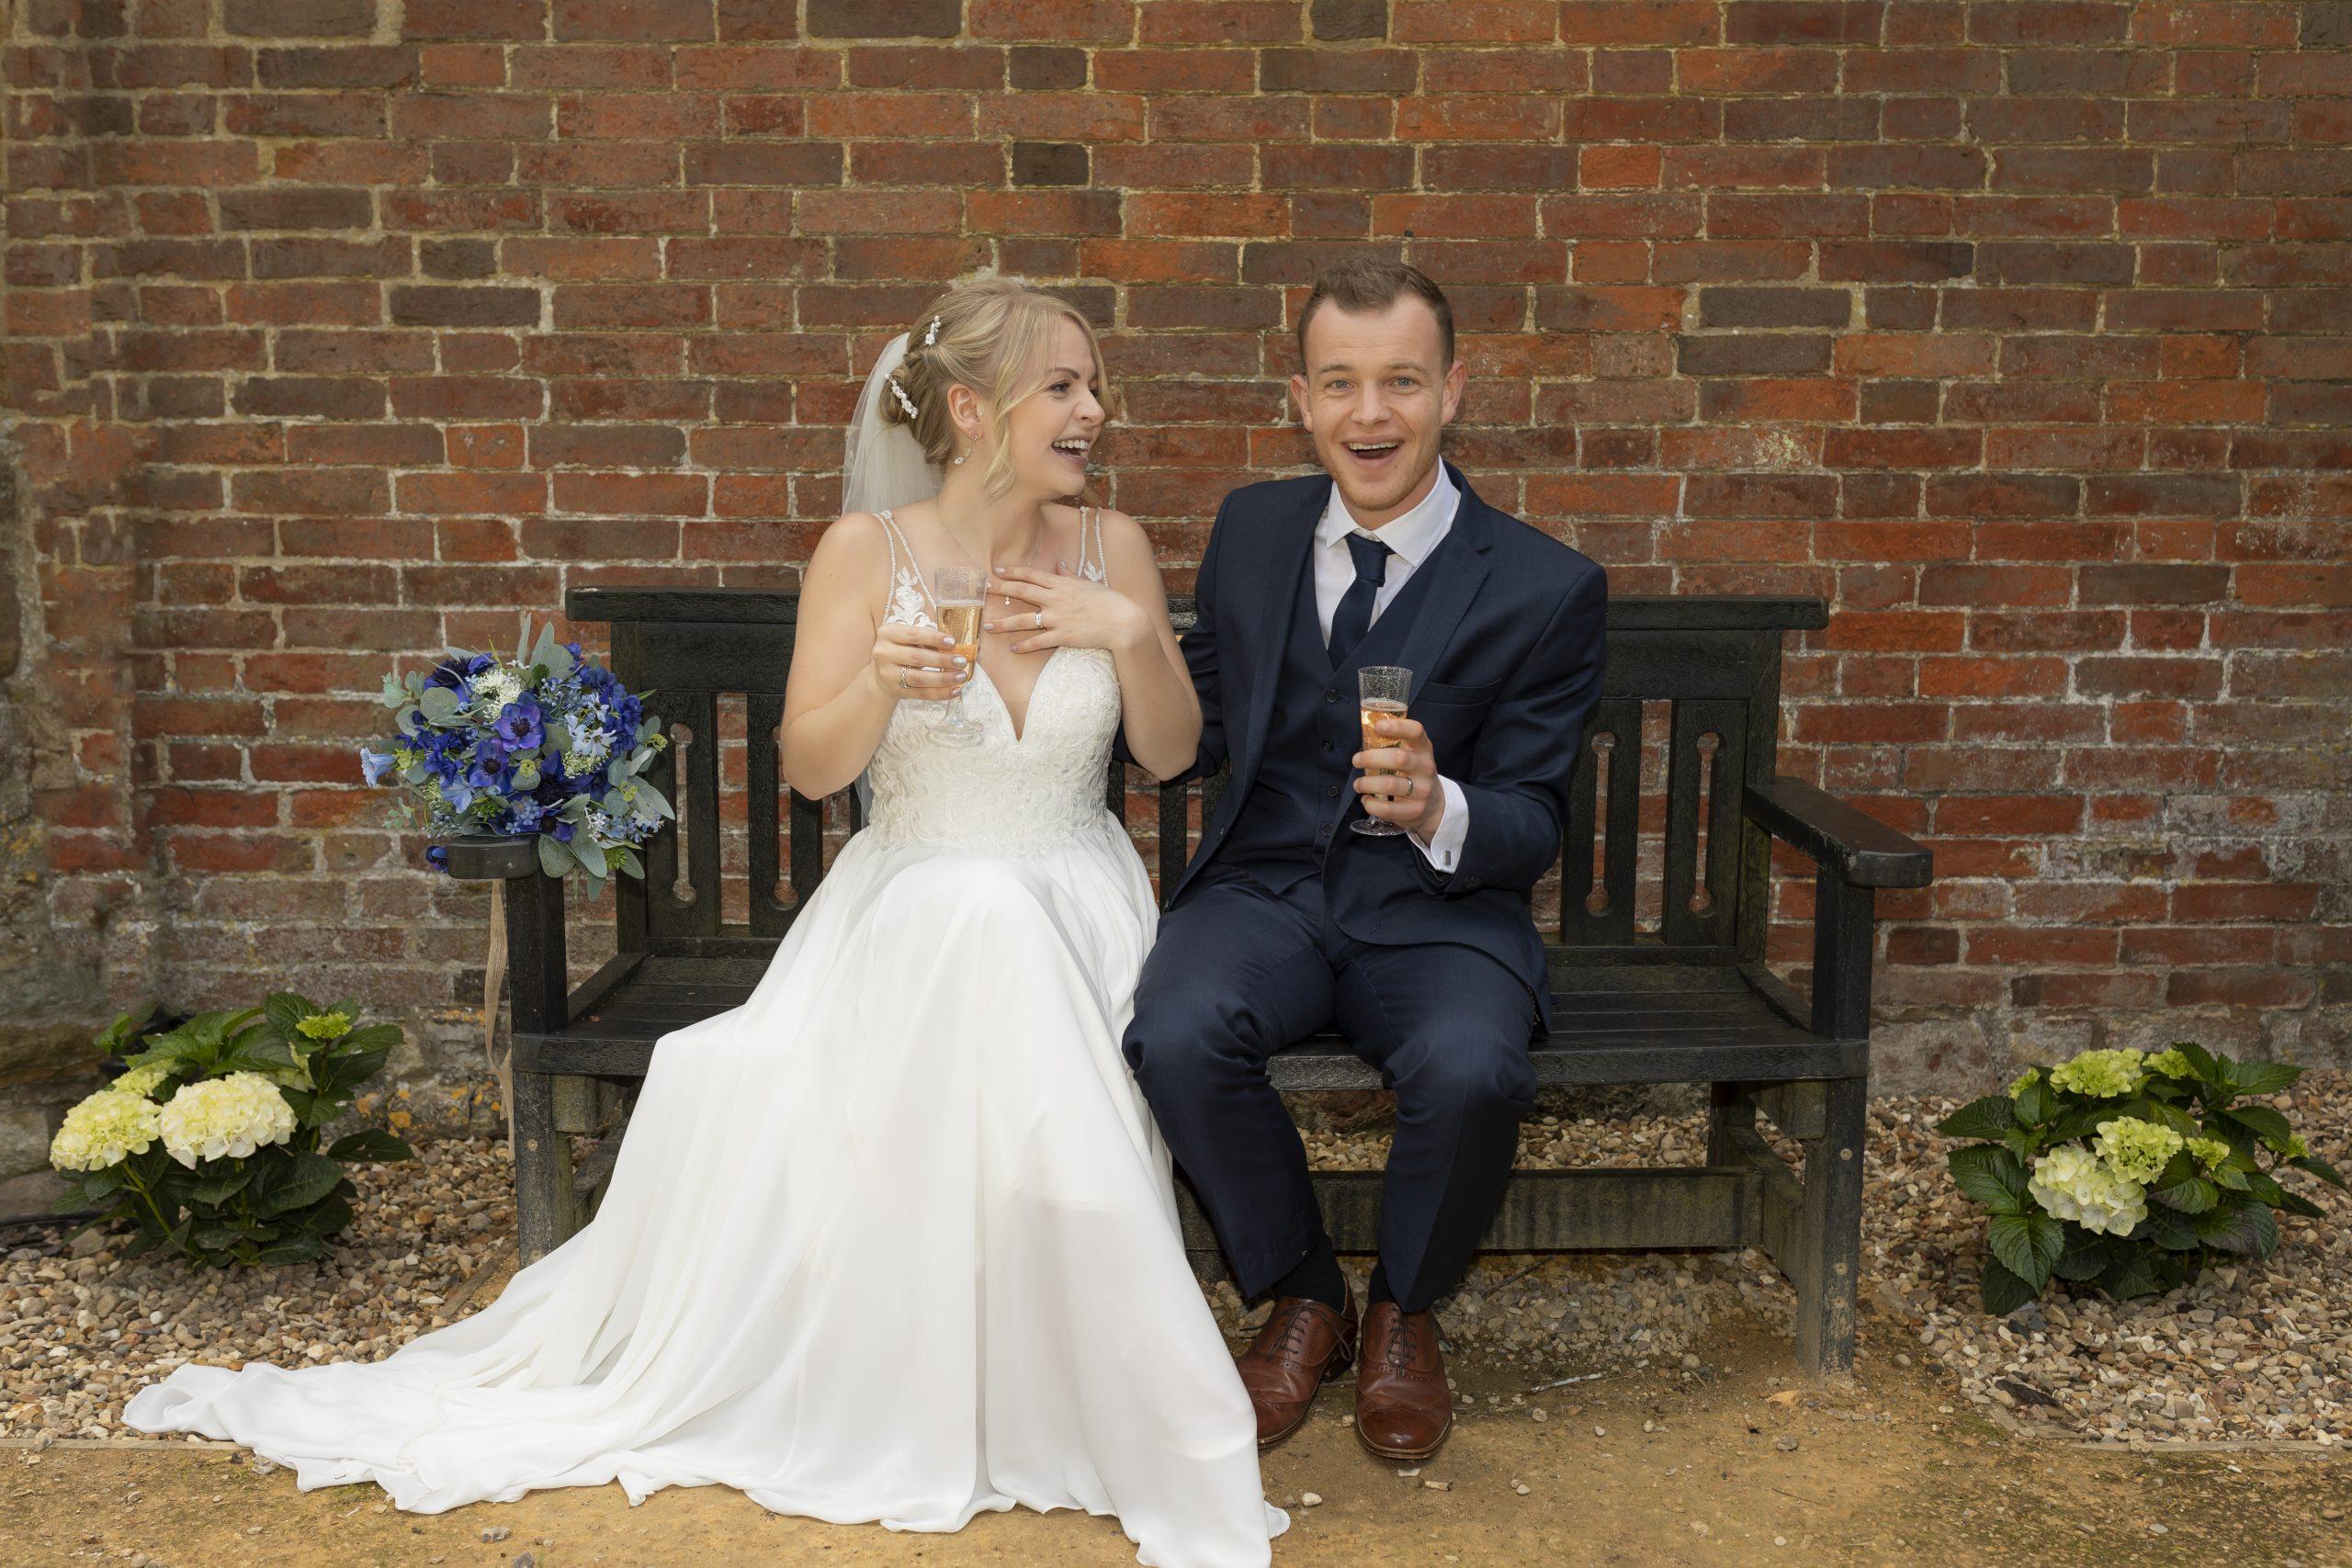 Joshua & Nicole Wedding St Johns Church Hillmorton - Emma Lowe Wedding Photography 2021